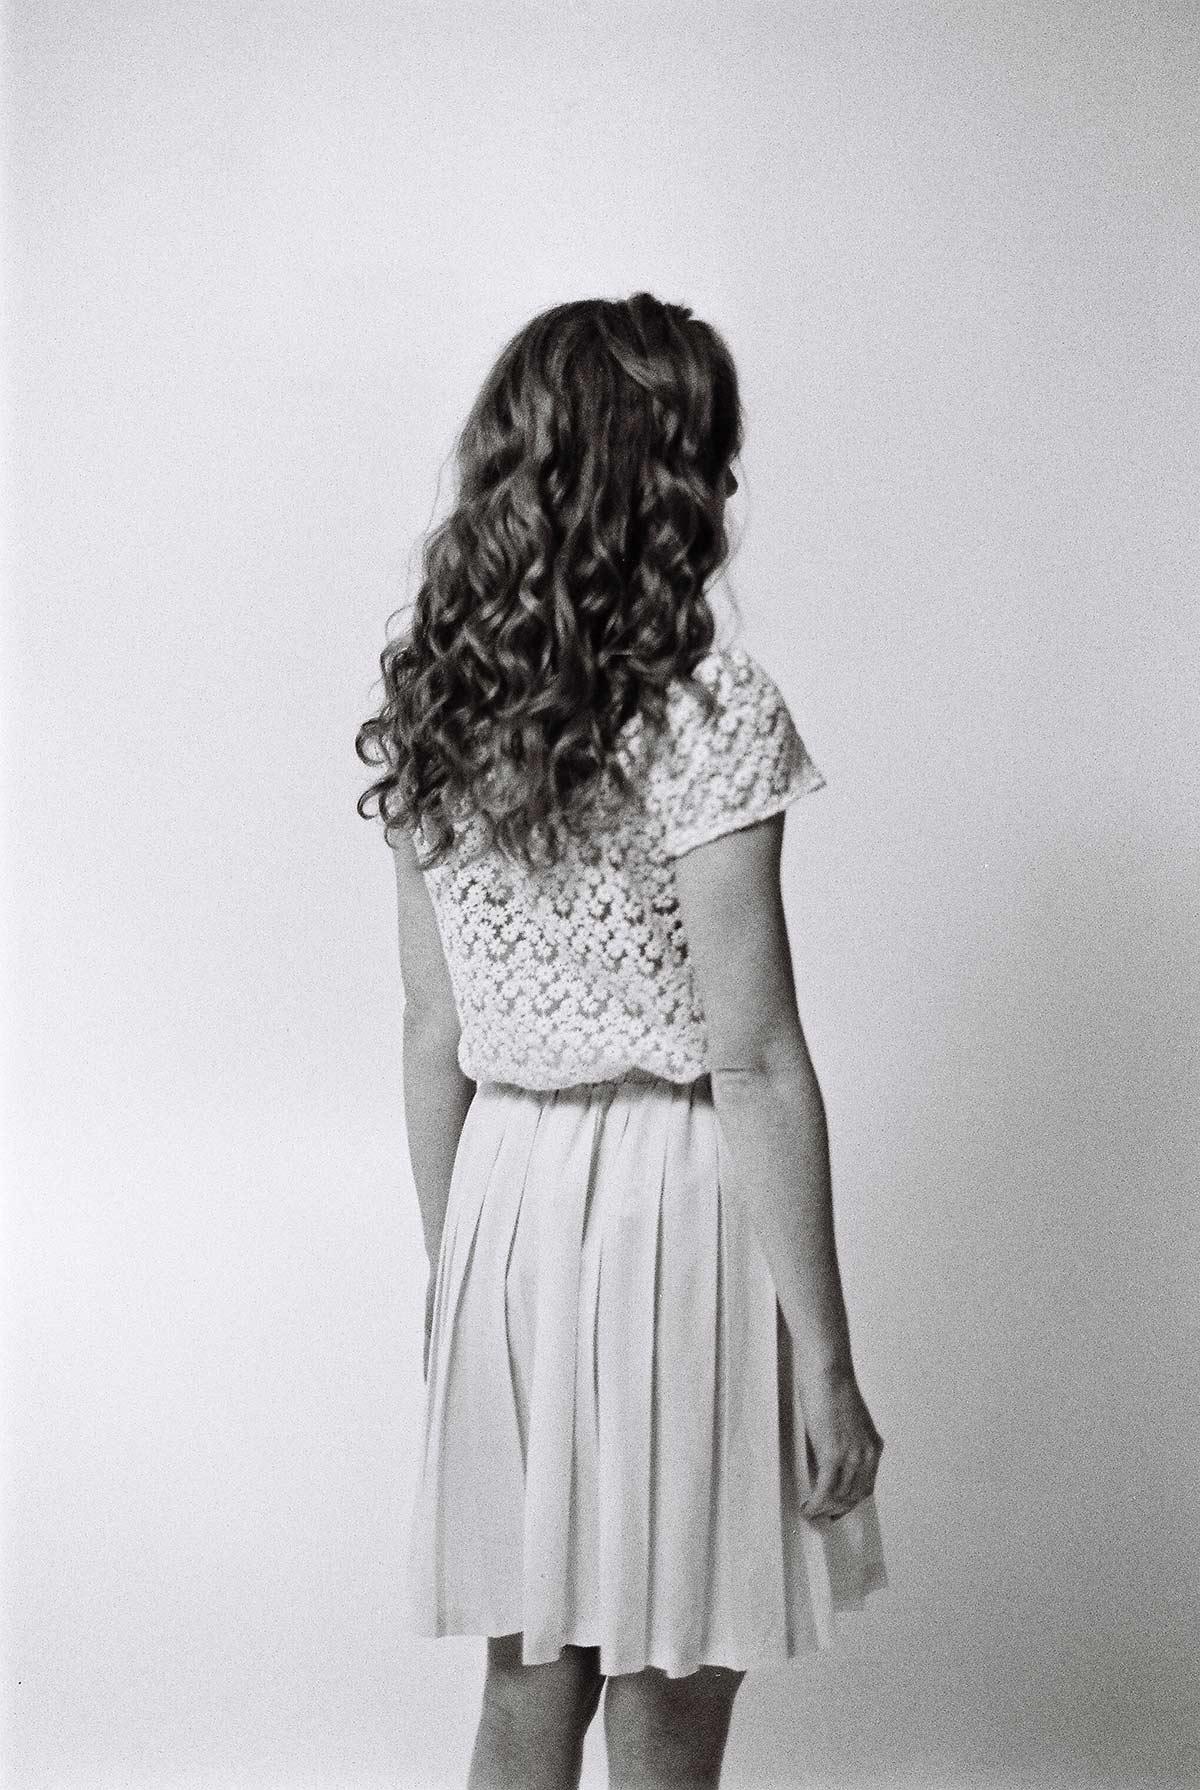 Atlanta portrait photographer